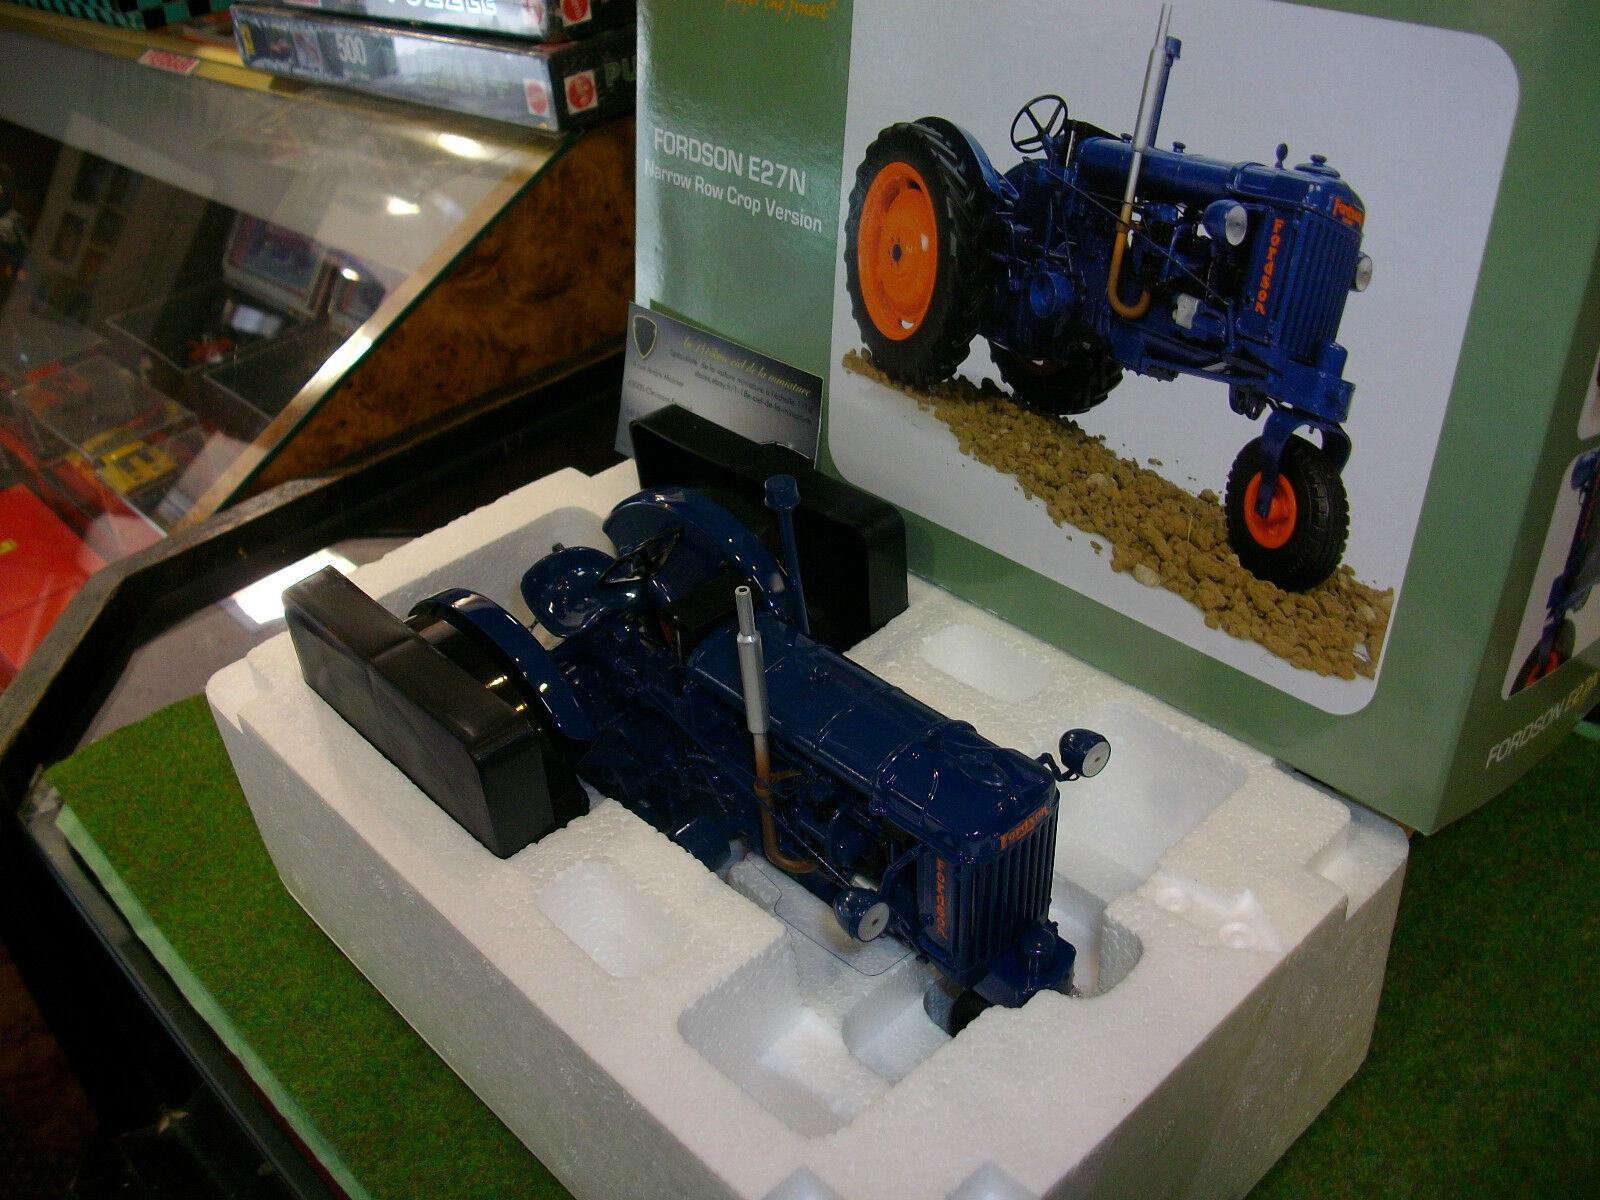 TRACTEUR AGRICOLE FORD E27 N bleu echell 1 16 UNIVERSAL HOBBIES UH2886 miniature